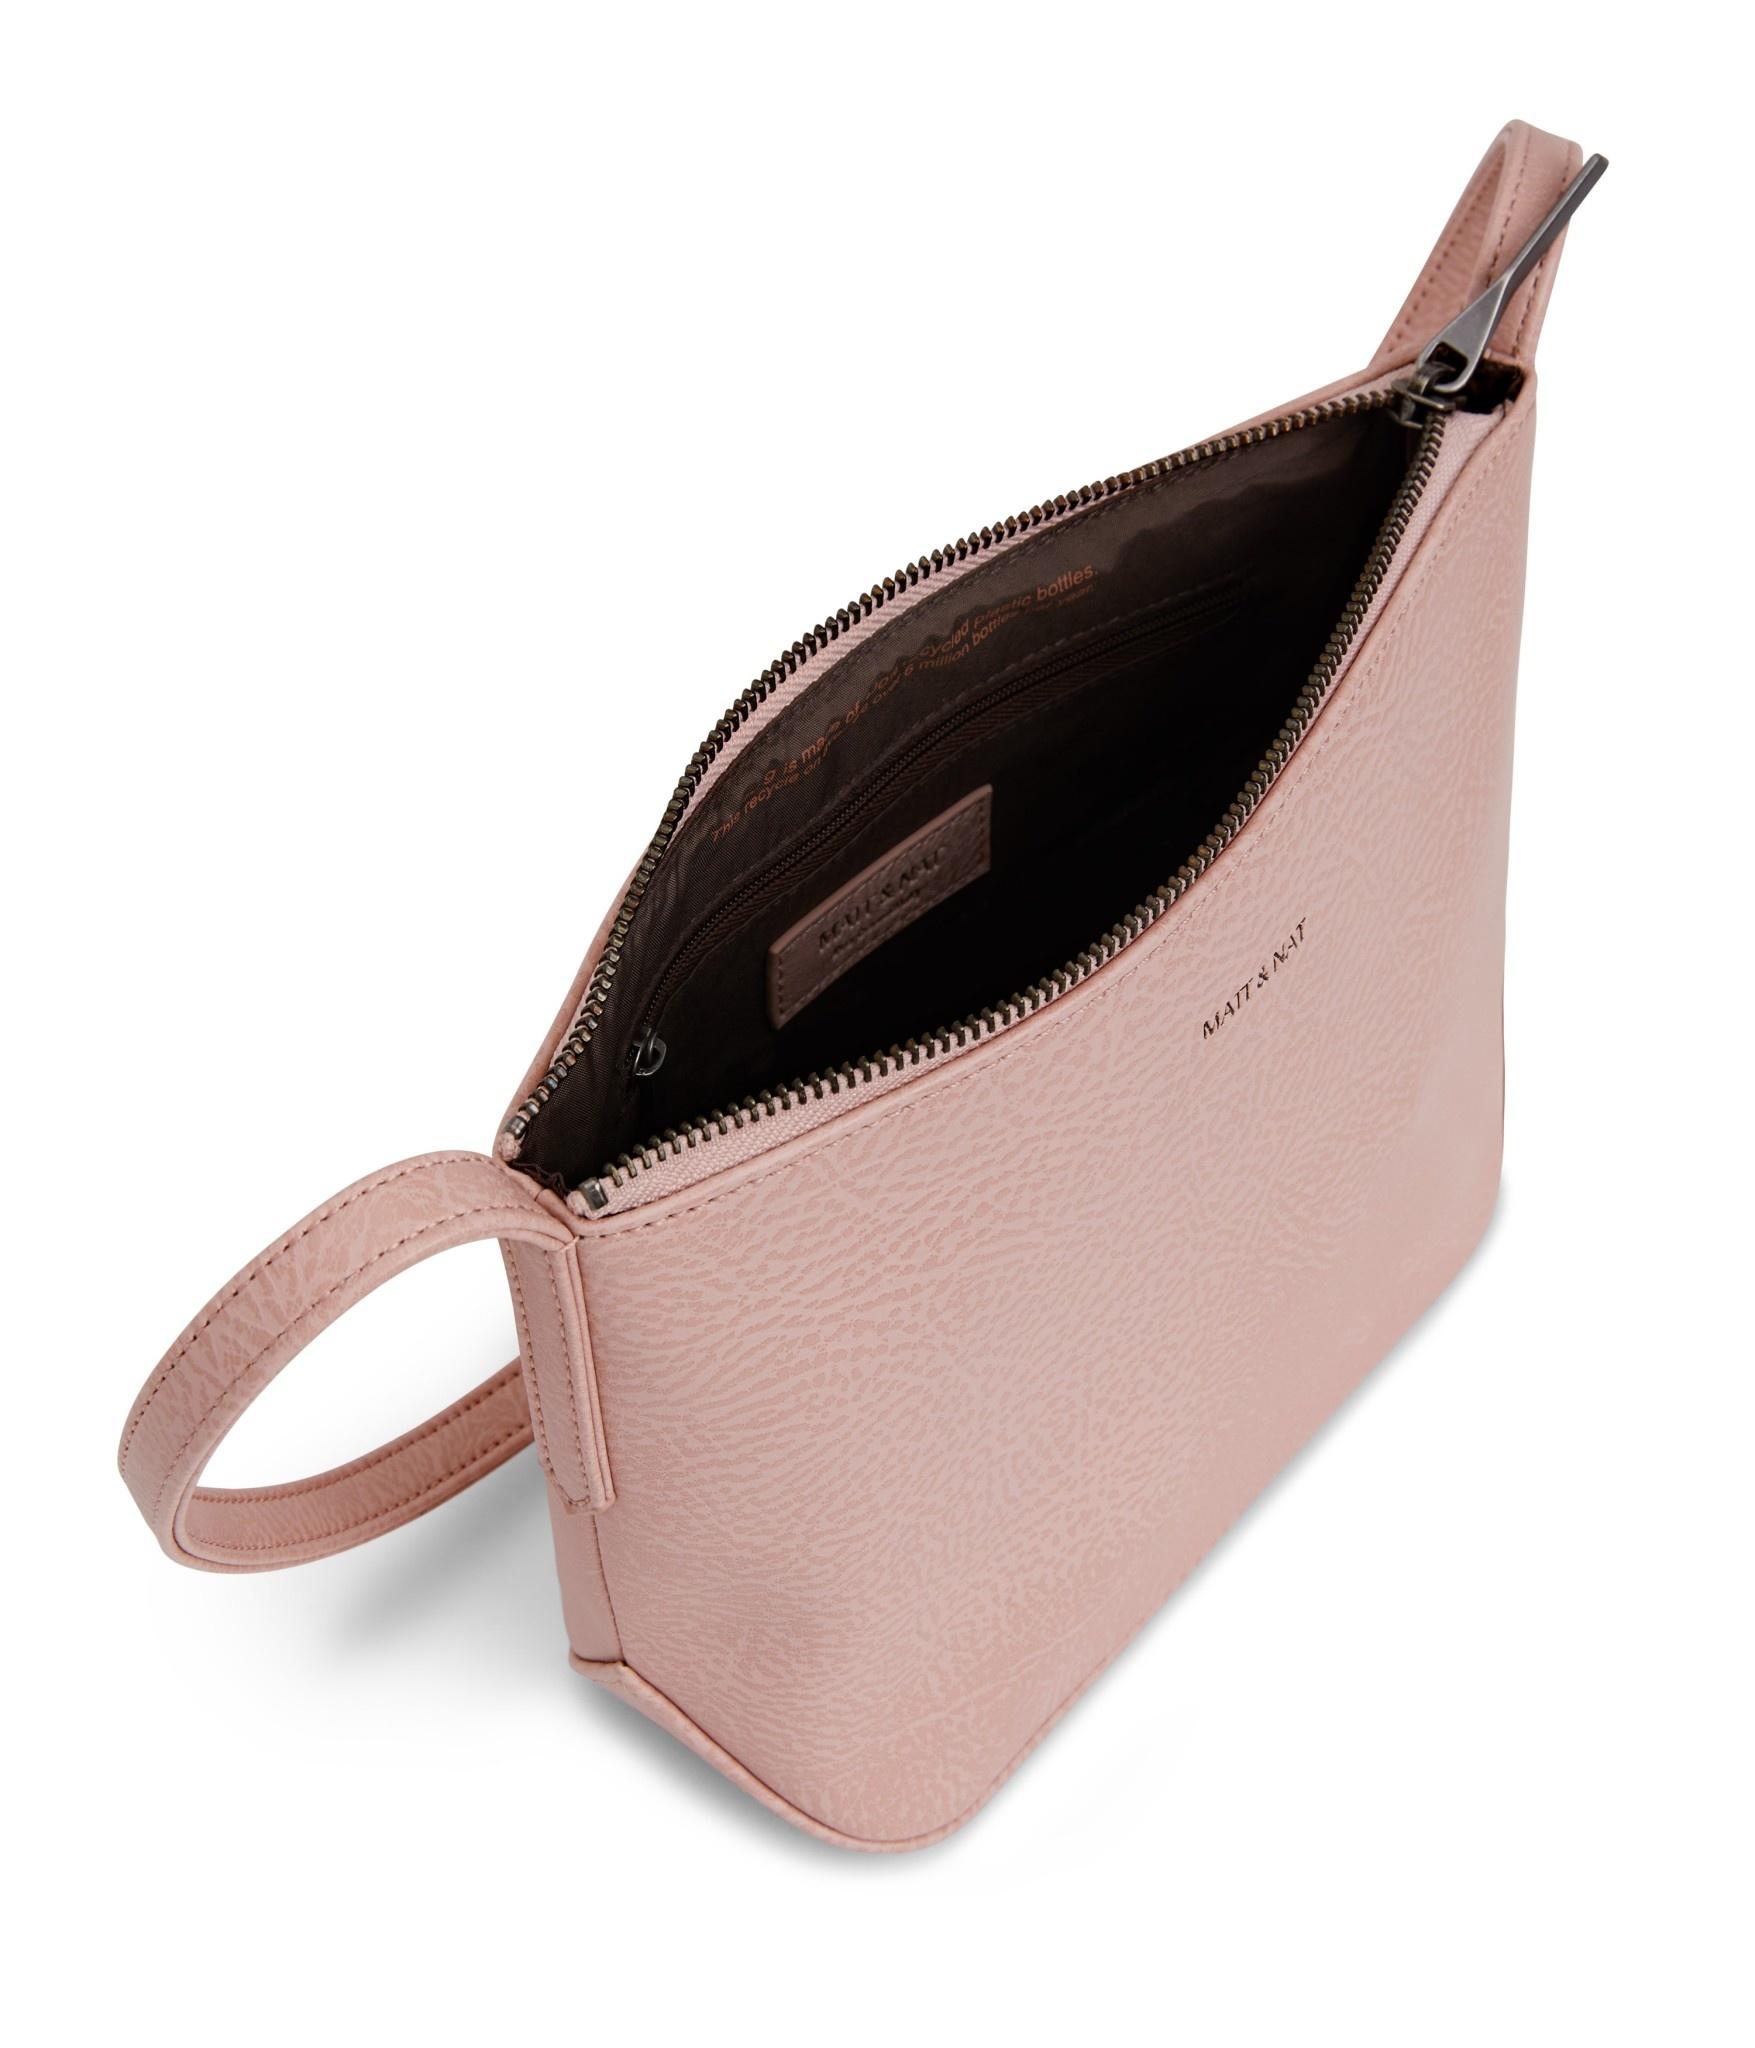 Sam Crossbody Bag Pebble Pink-2